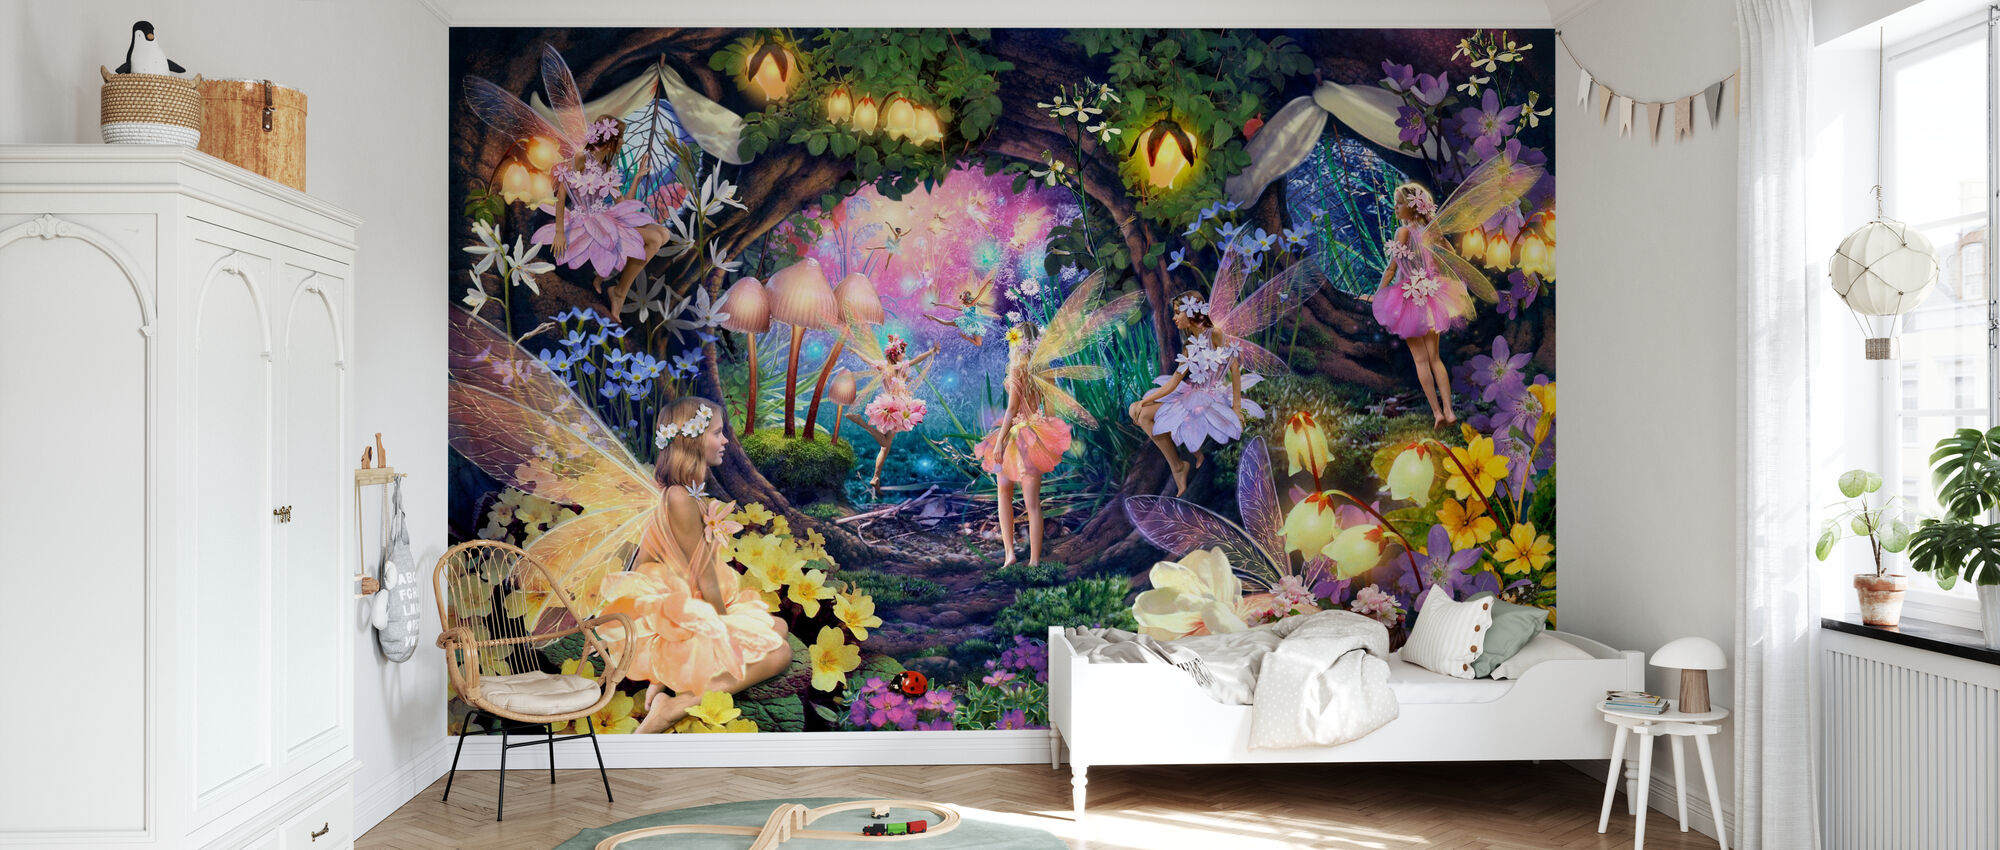 Fairy Hollow - Wallpaper - Kids Room